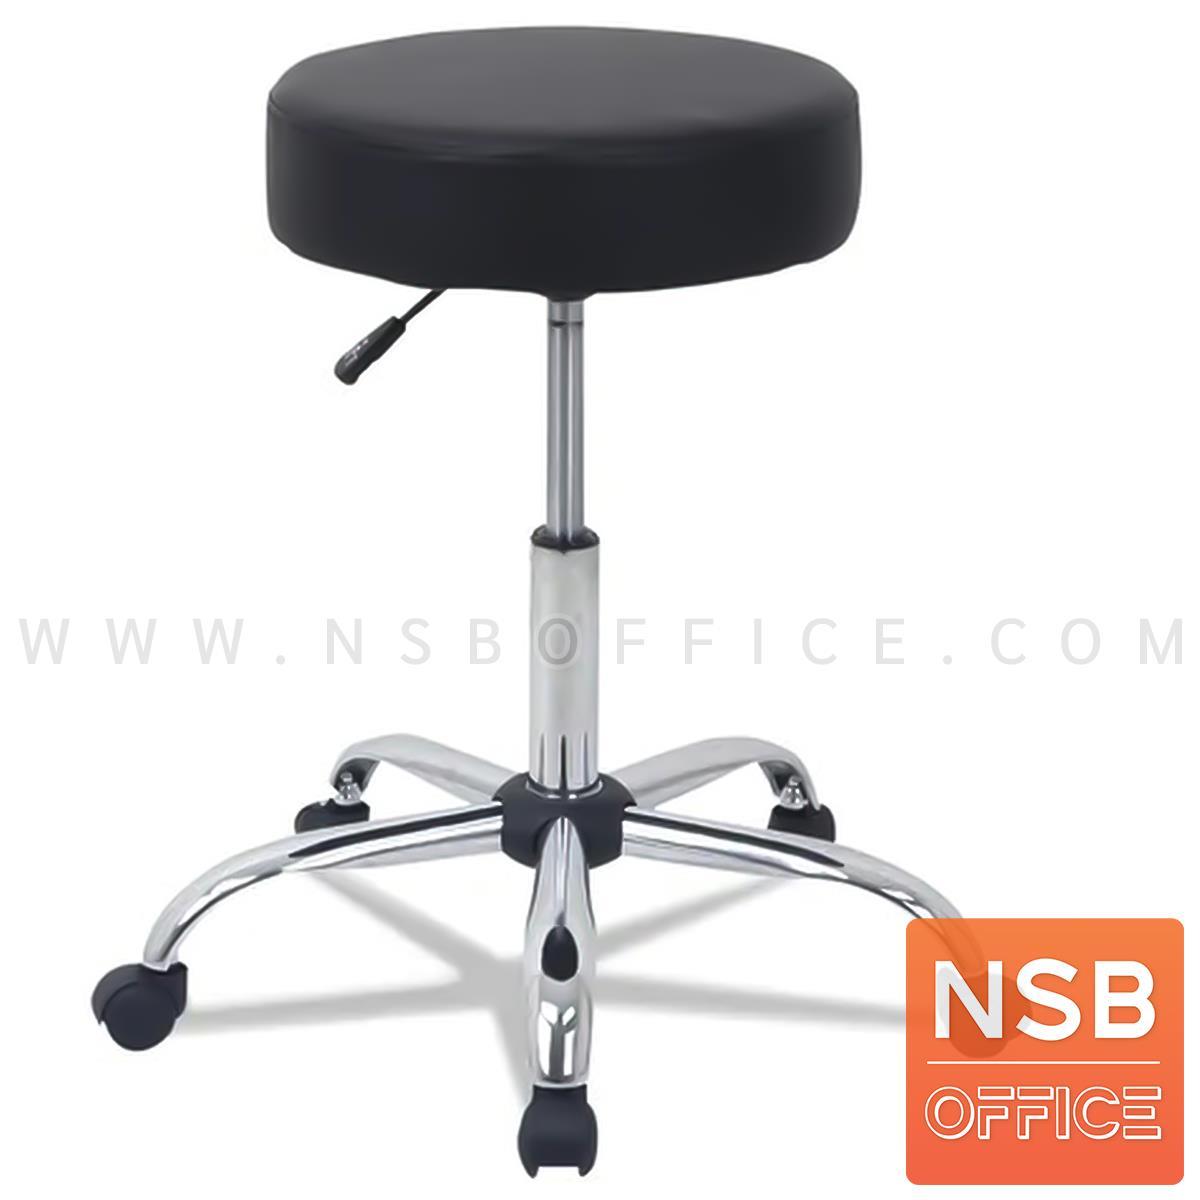 B02A103:เก้าอี้บาร์สตูลที่นั่งกลม รุ่น Sanyo (ซันโย)  ล้อเลื่อน